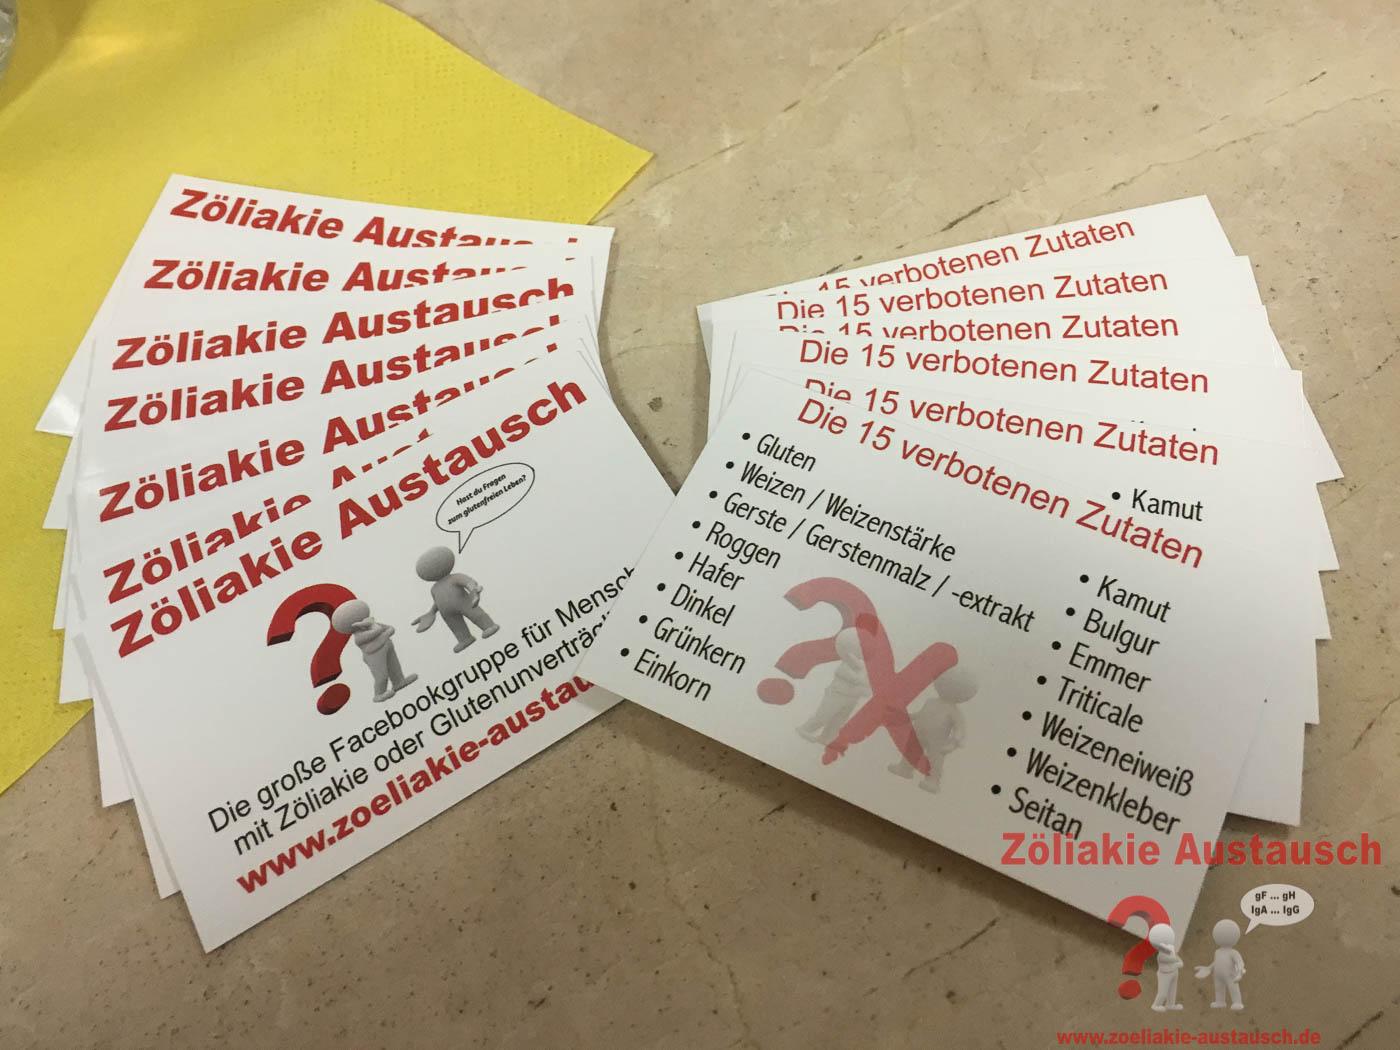 Zoeliakie_Austausch_Tanja_Gruber-Backkurs_2017-028